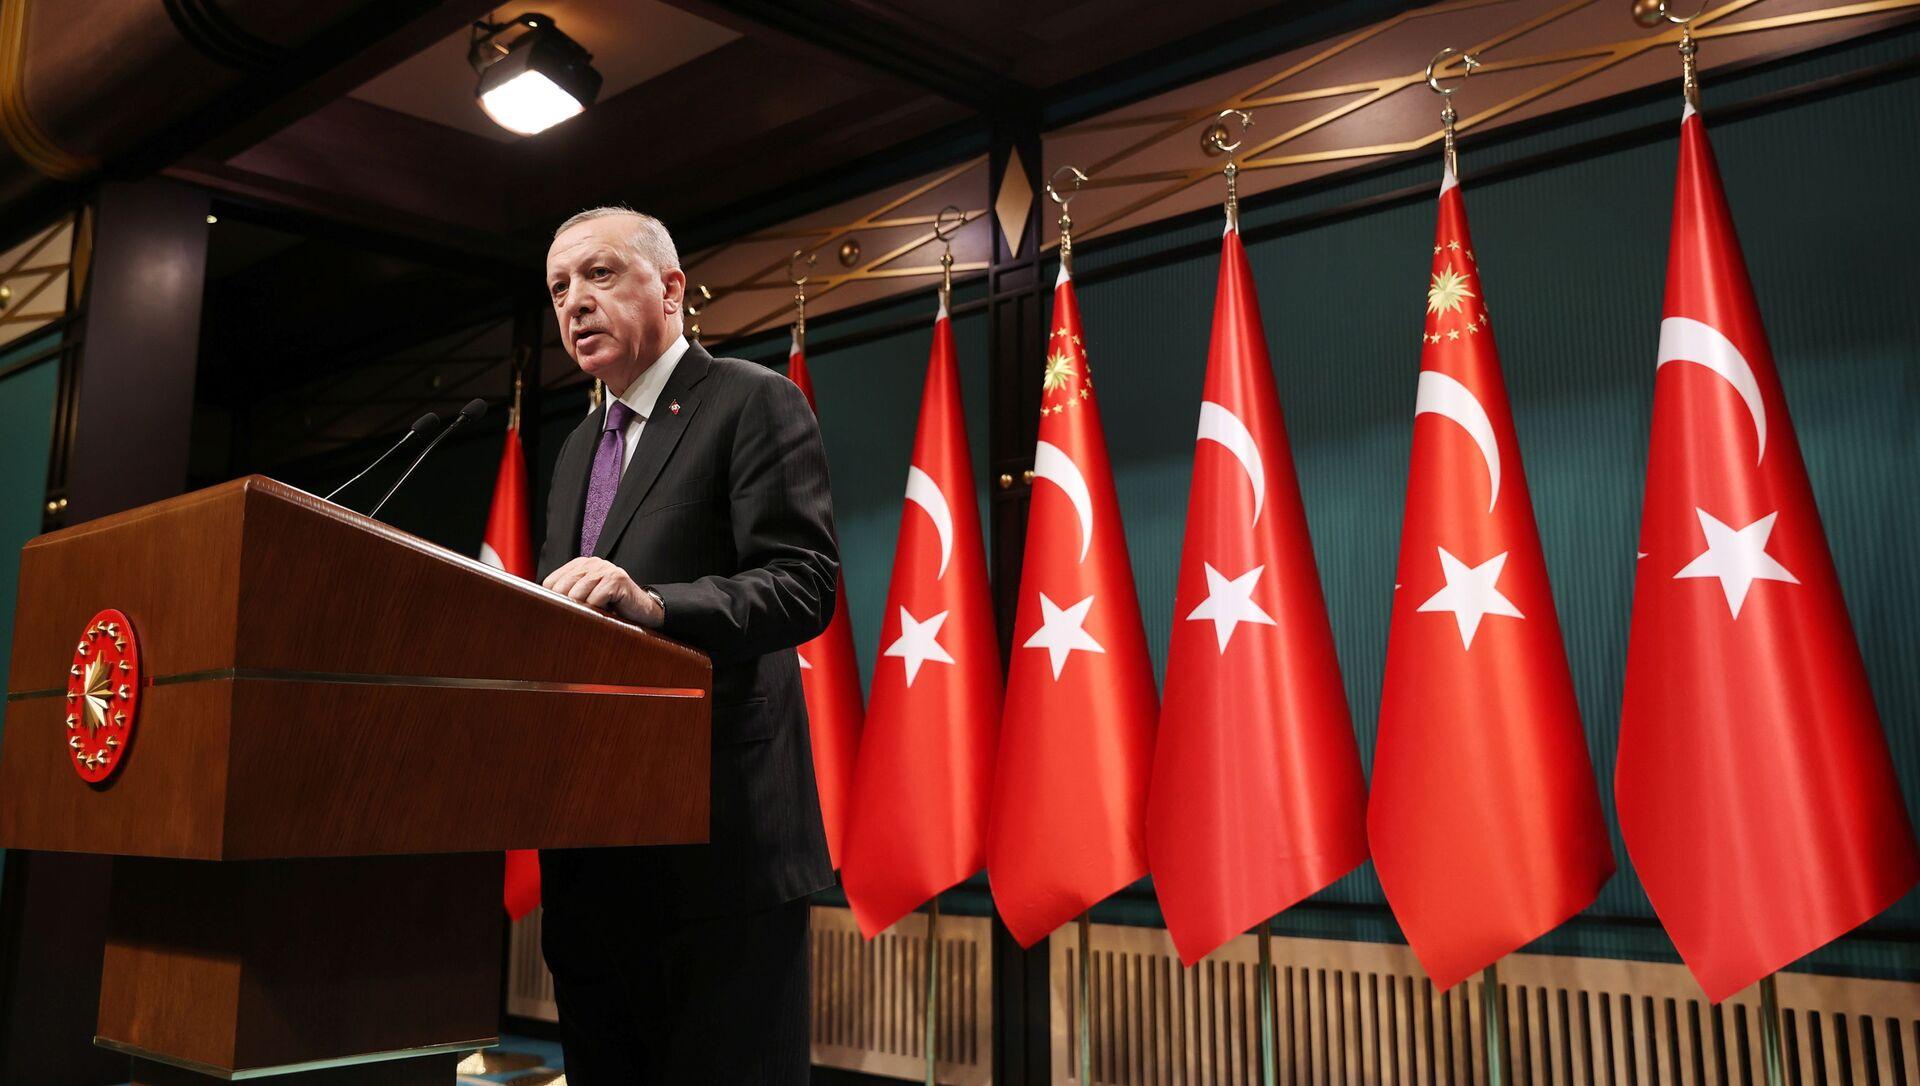 Turkish President Tayyip Erdogan speaks during a news conference following a cabinet meetingin Ankara, Turkey February 1, 2021. - Sputnik Italia, 1920, 09.02.2021